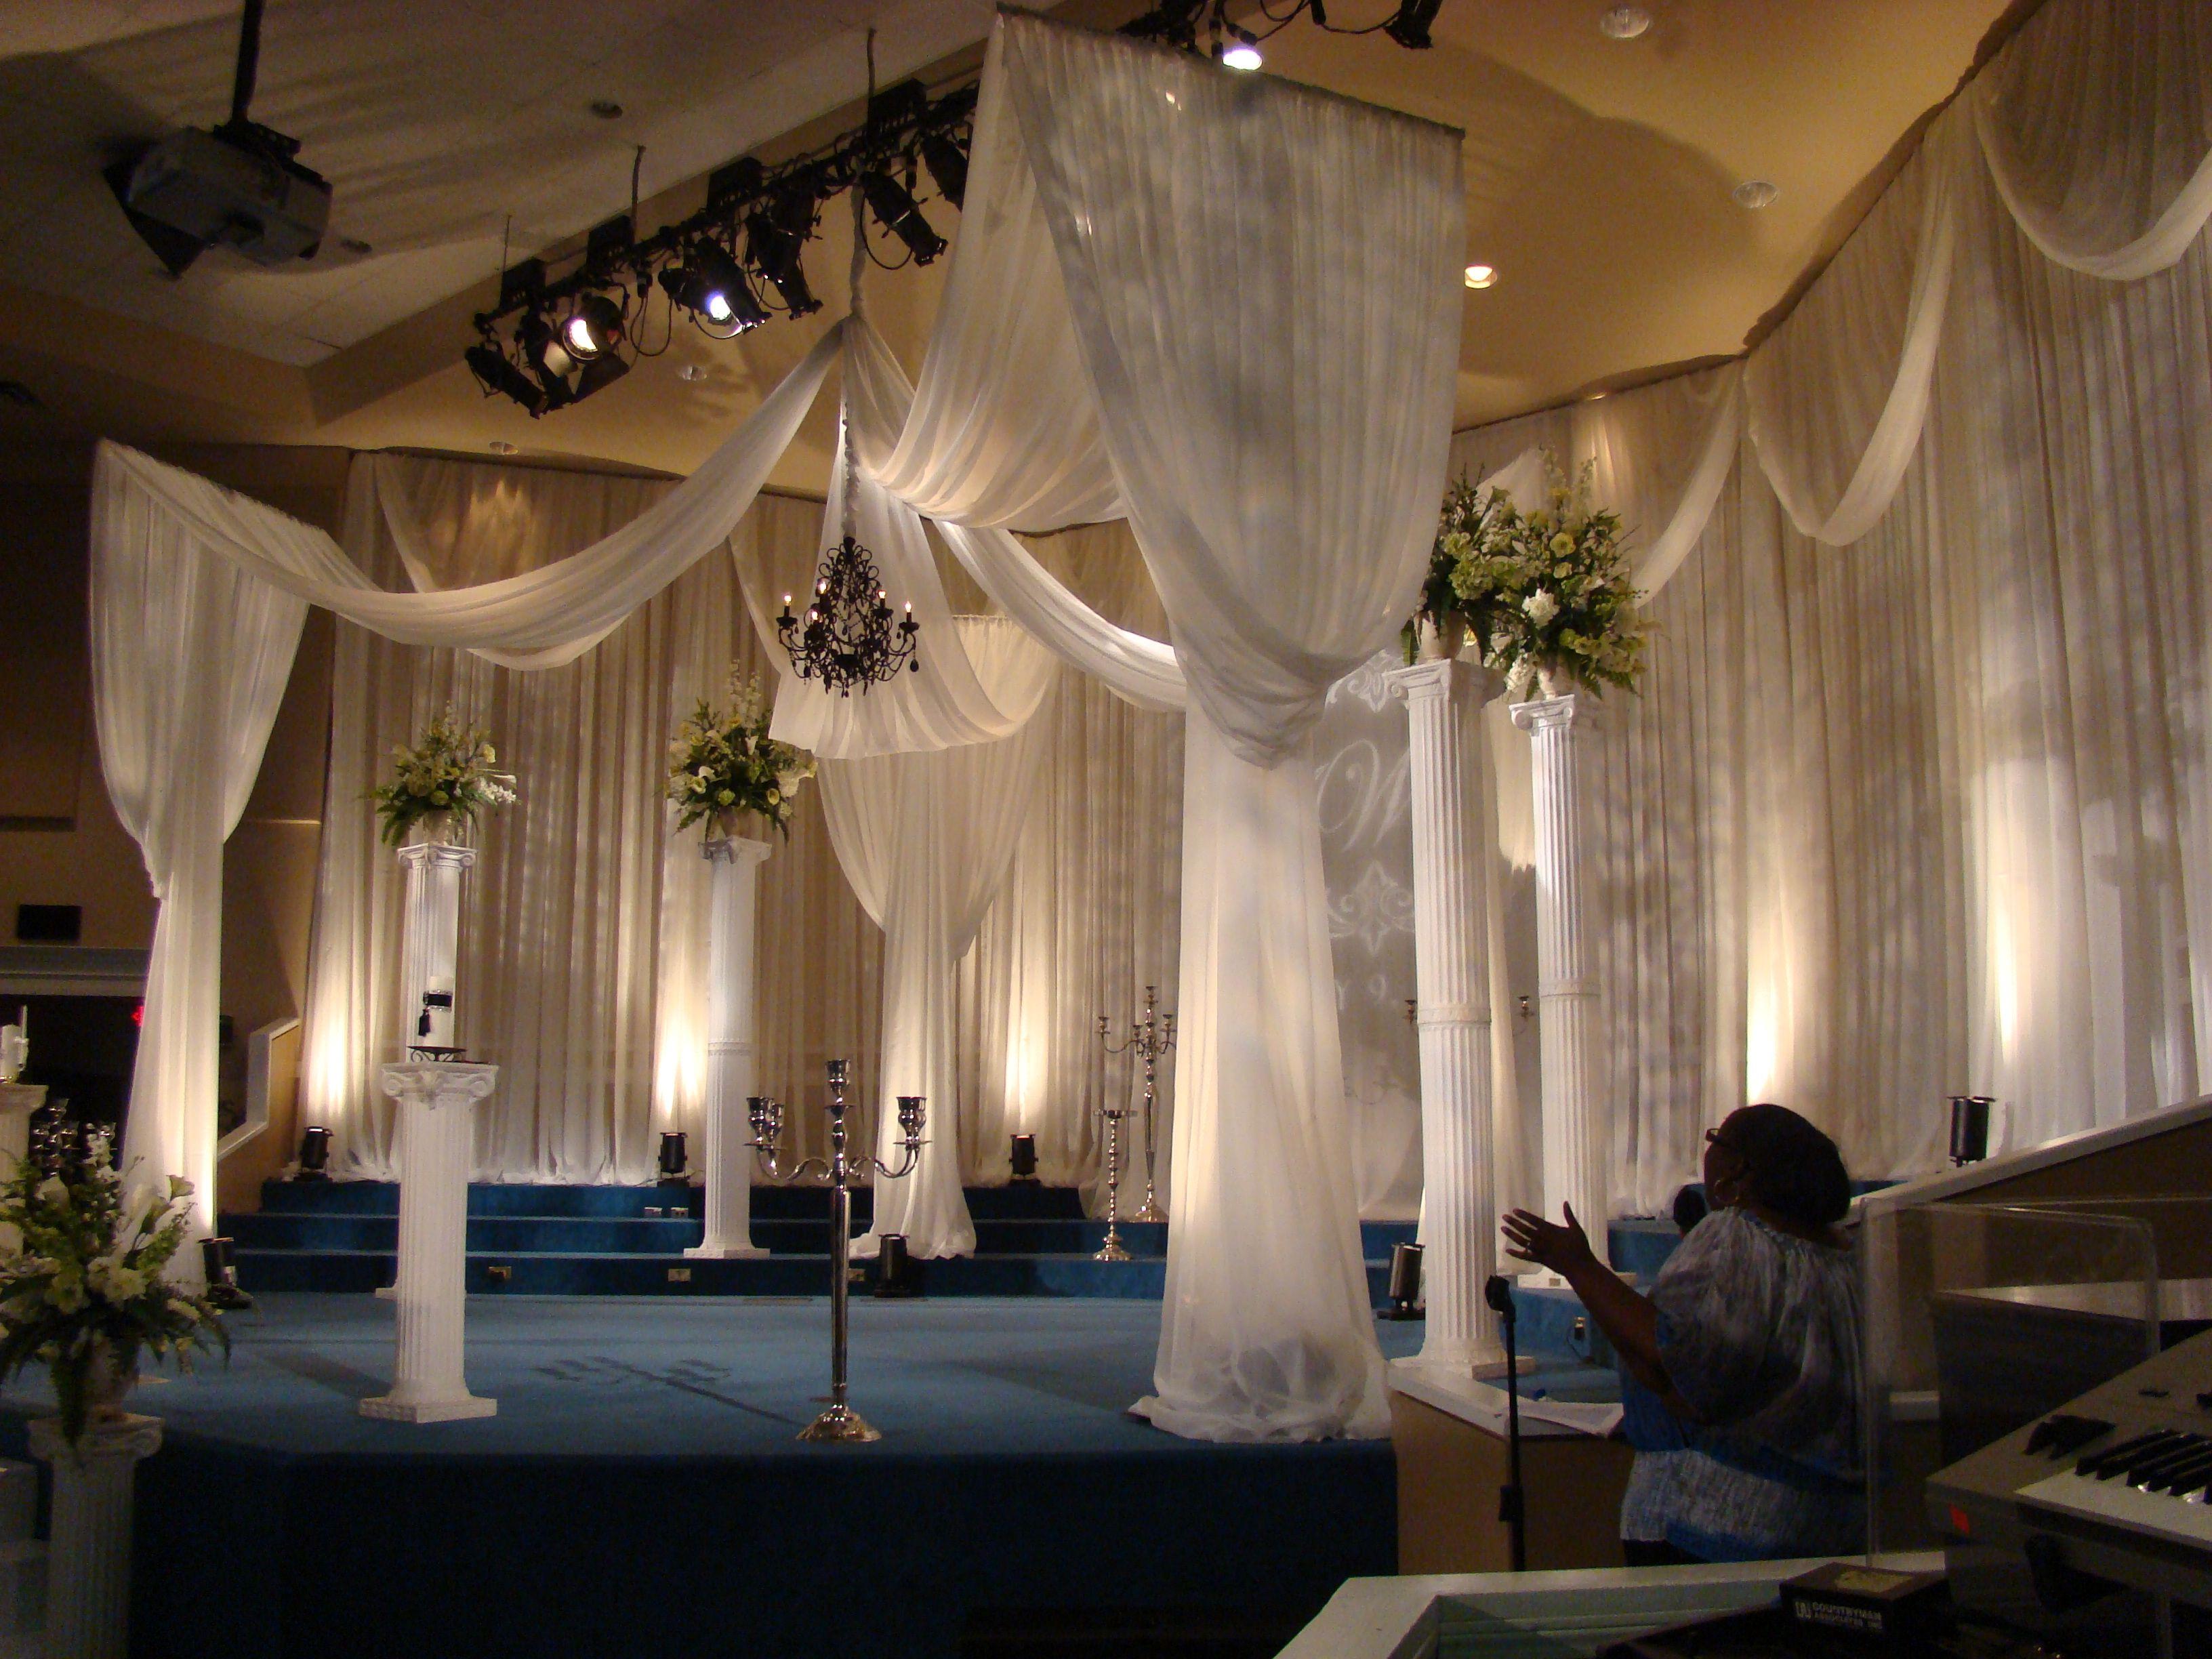 Elegant Drapery At Indoor Ceremony: Draped Stage Setup By EventsPlusNashvil... #Stage #wedding